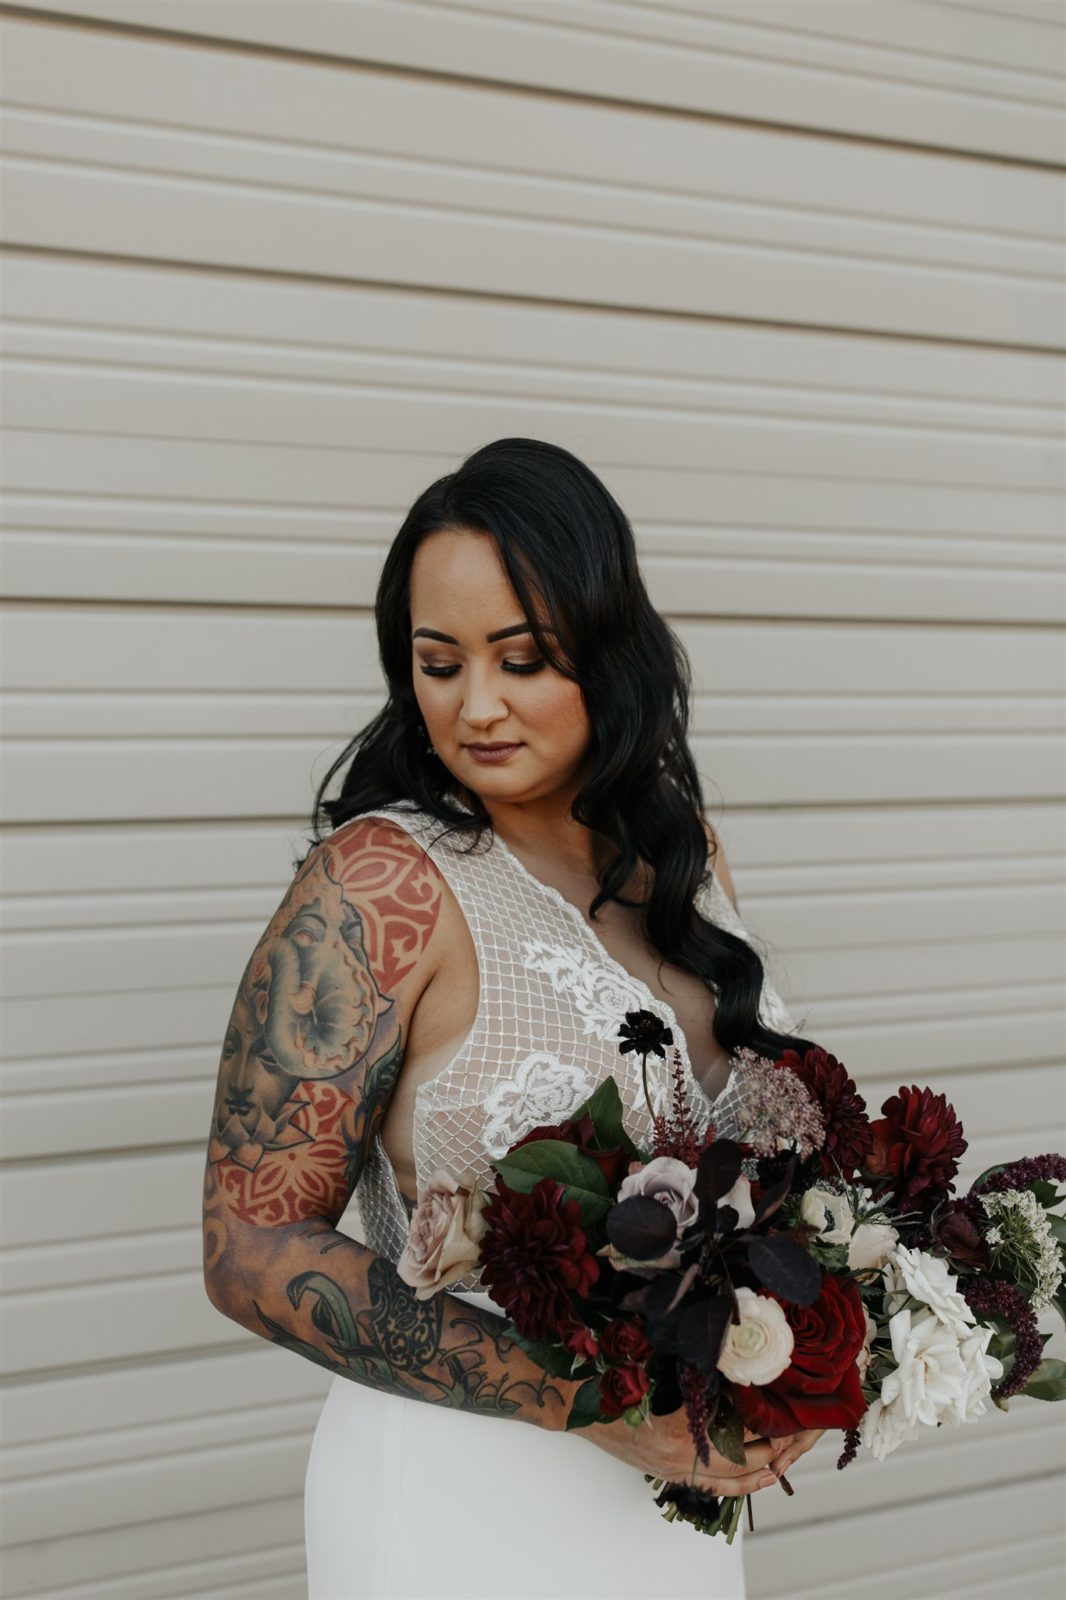 Edgy Bridal Fashion for DFW Wedding on Alexa Kay Events